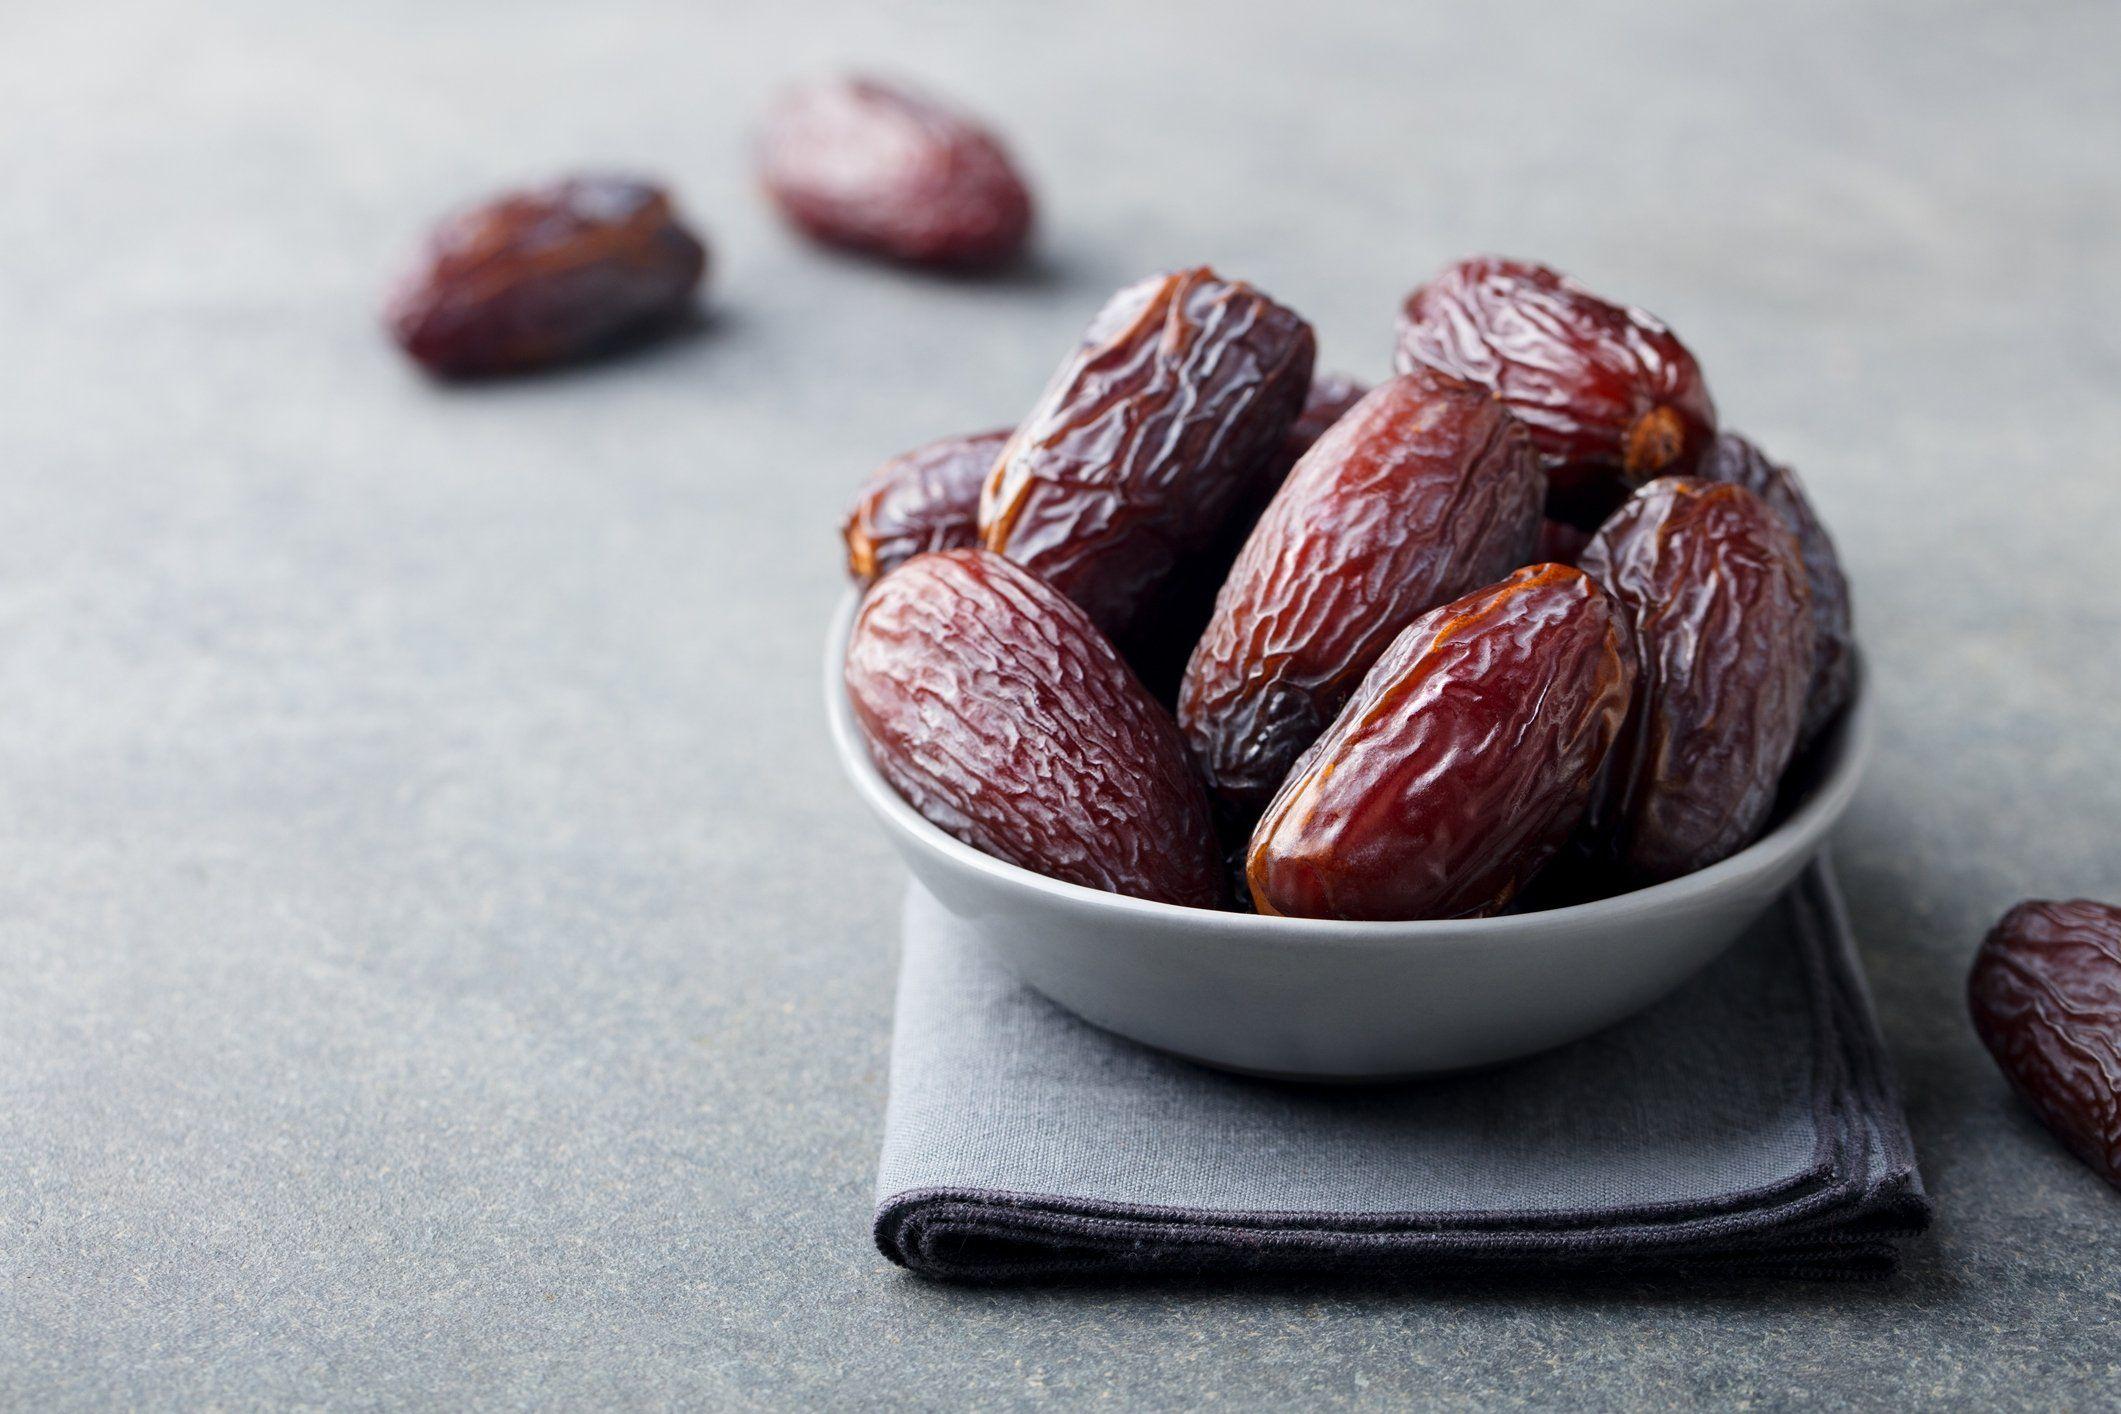 Sunnahs of Eid   Eat Dates in Odd Numbers (1,3,5,7, etc.)